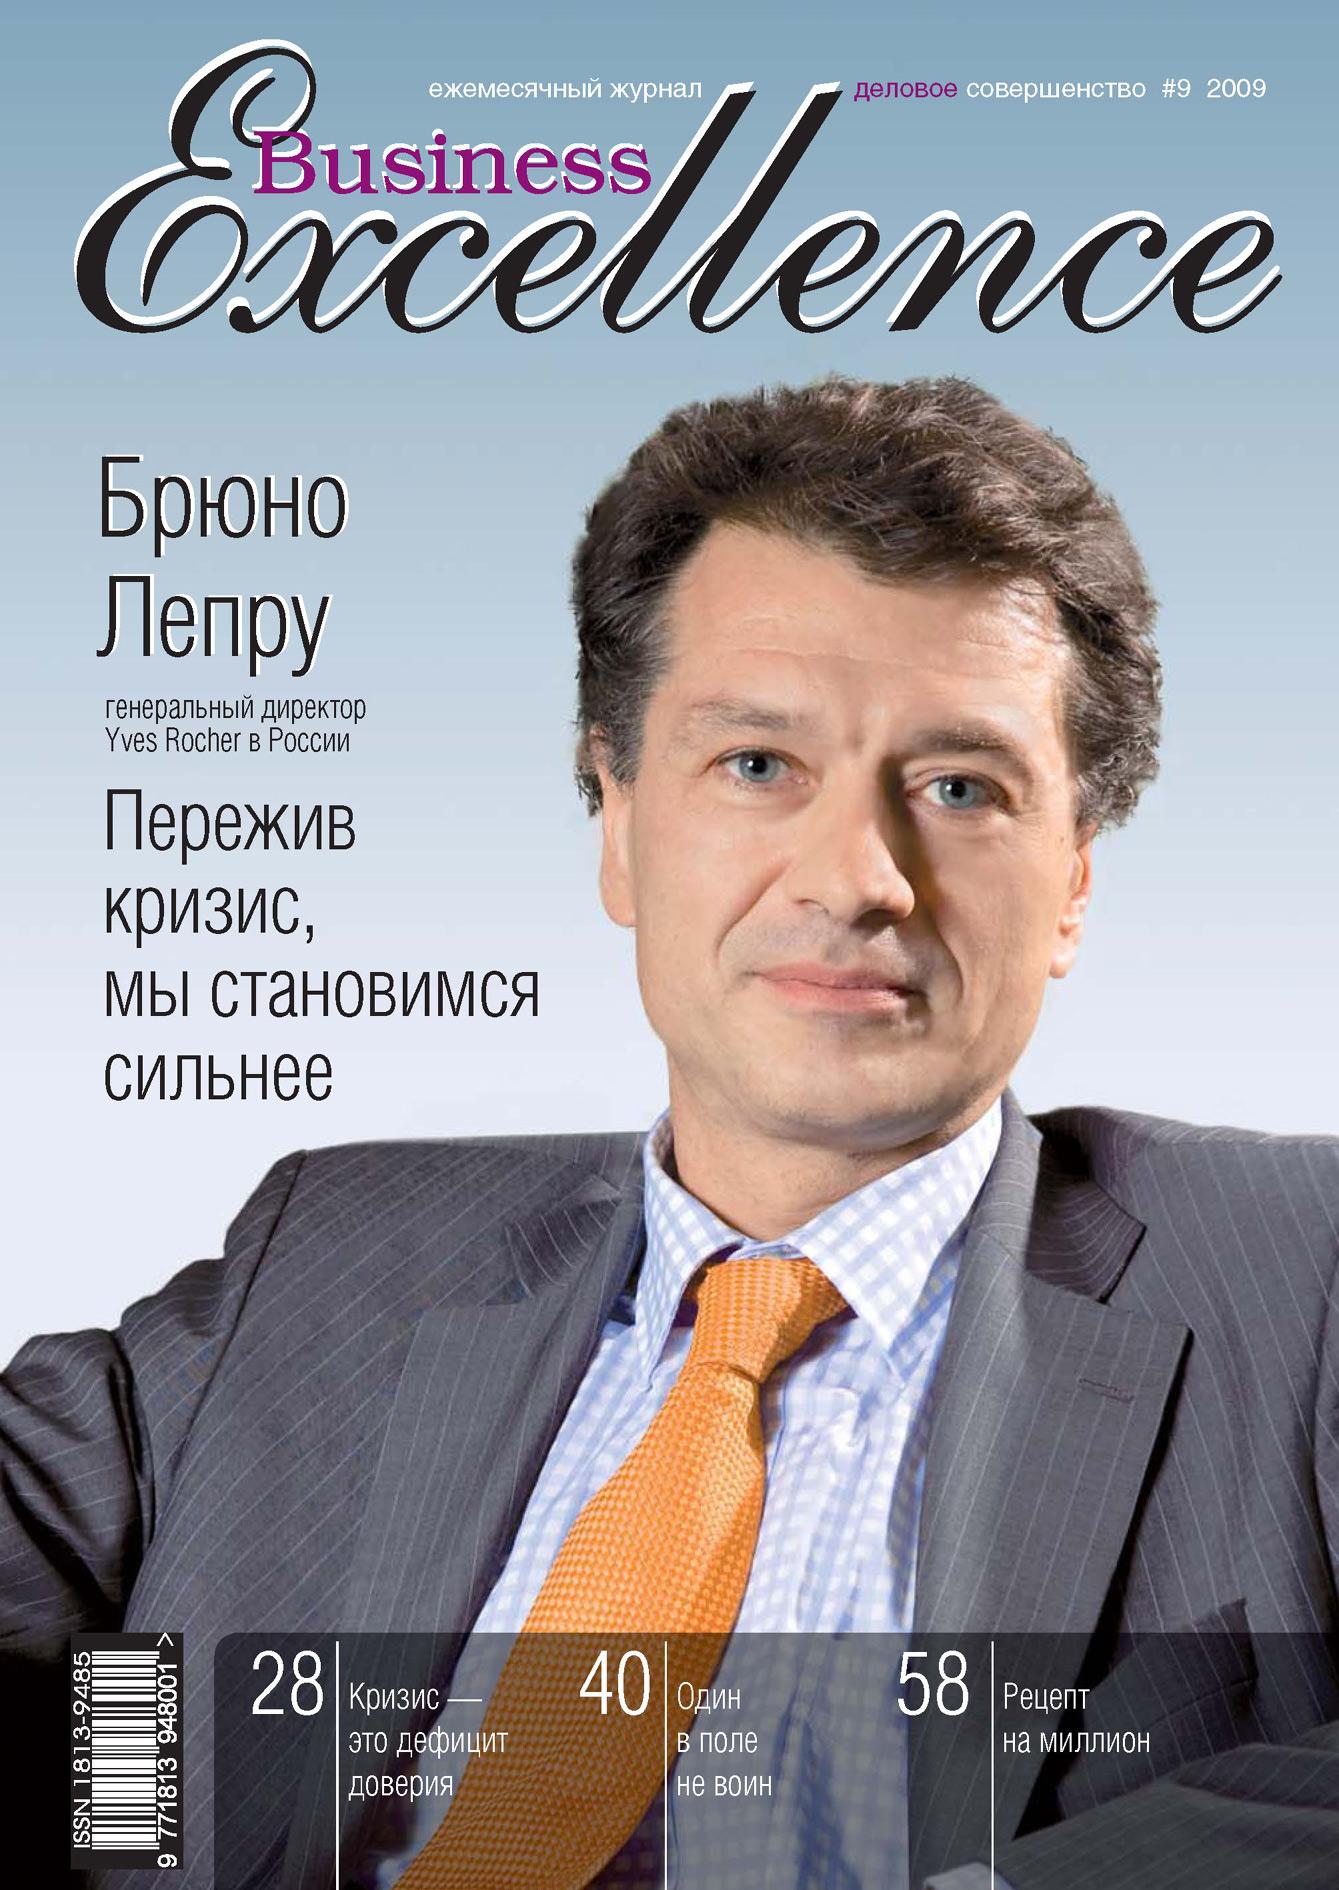 Отсутствует Business Excellence (Деловое совершенство) № 9 2009